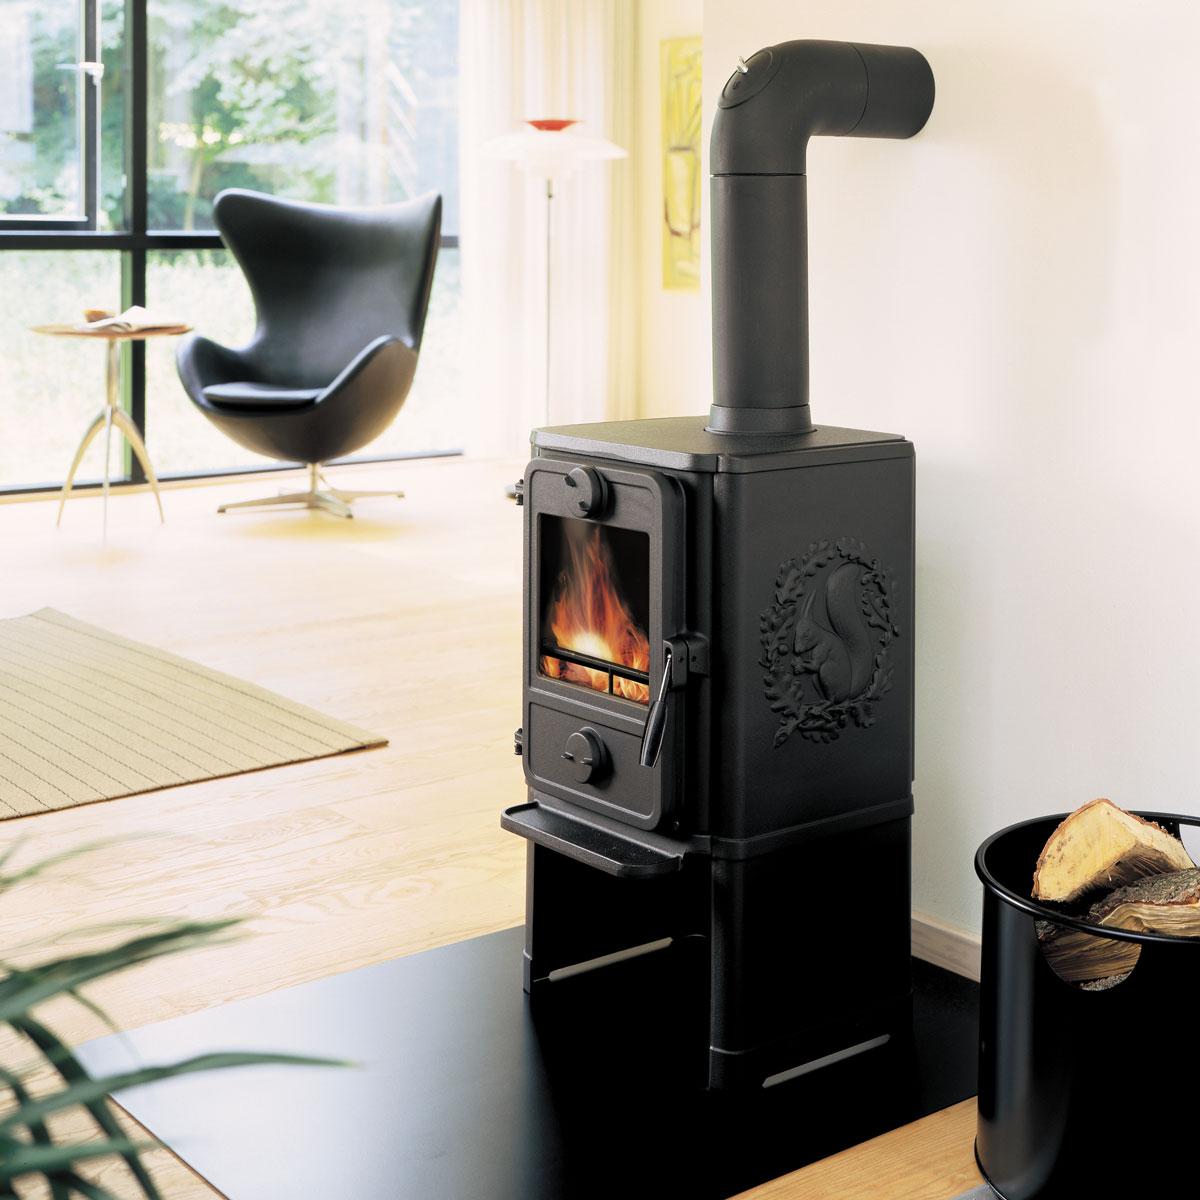 Morso 1440 wood heater in living room